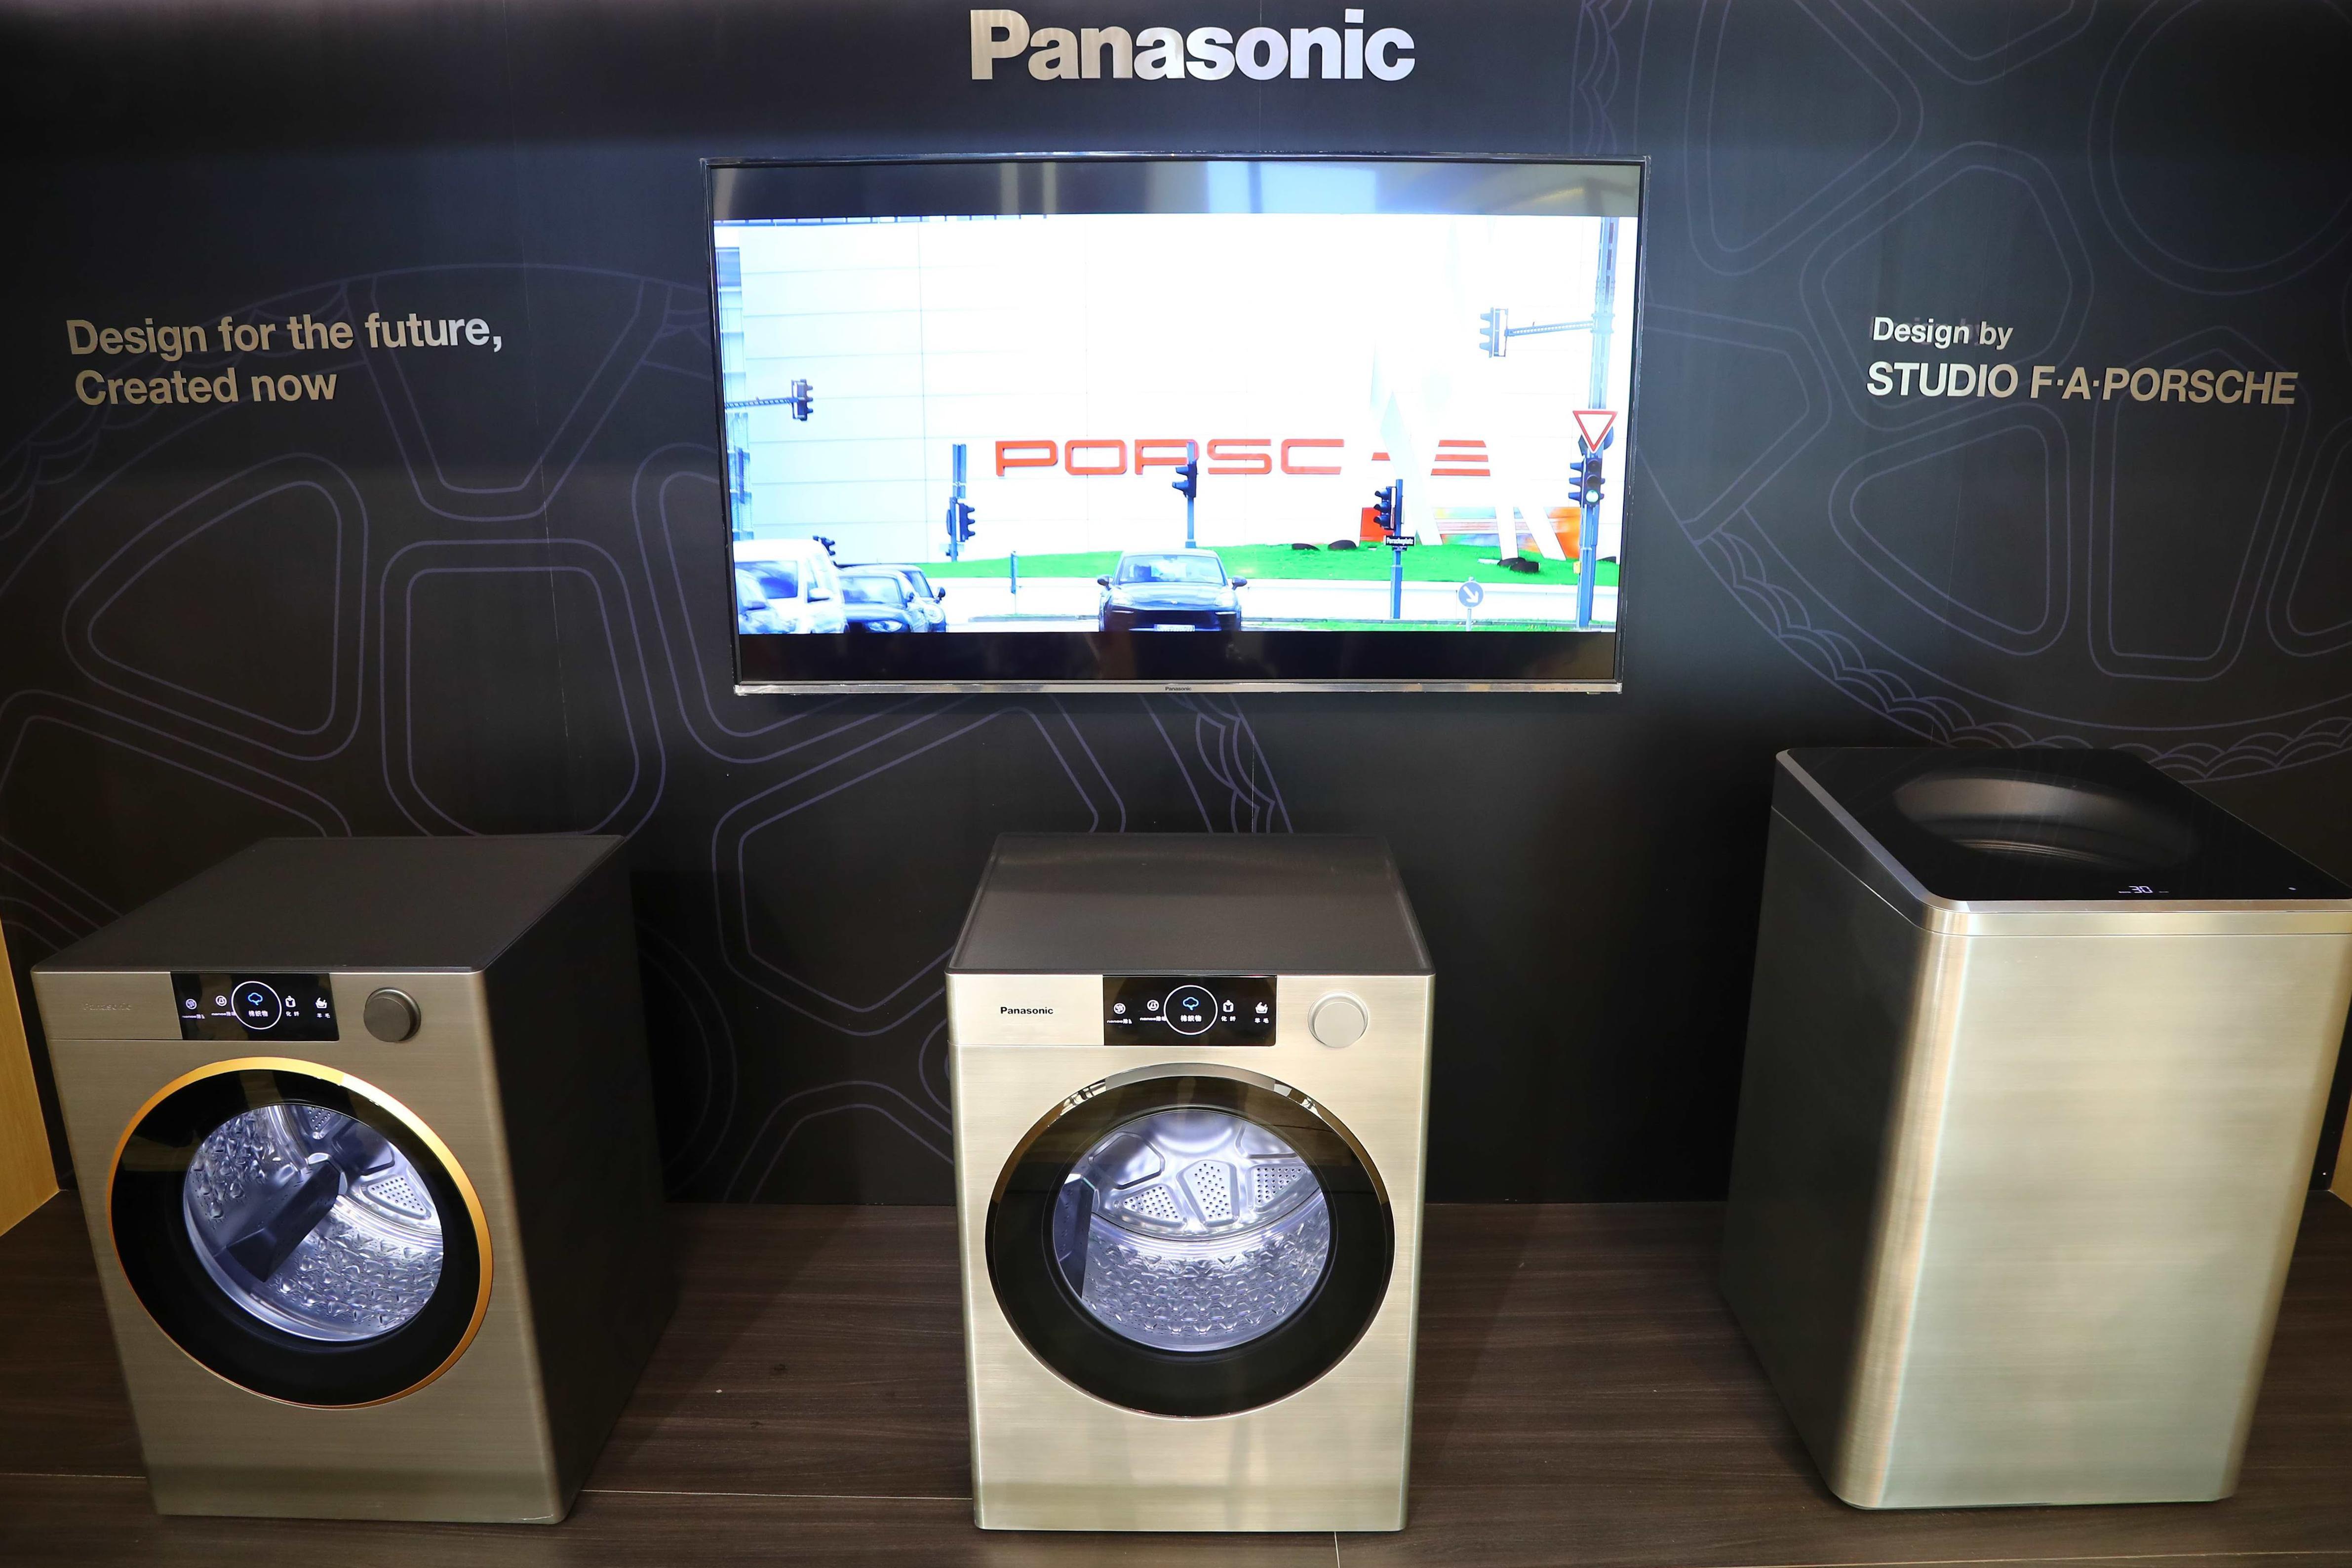 photo: Porsche Design Washing Machine corner at AWE 2018 Panasonic booth